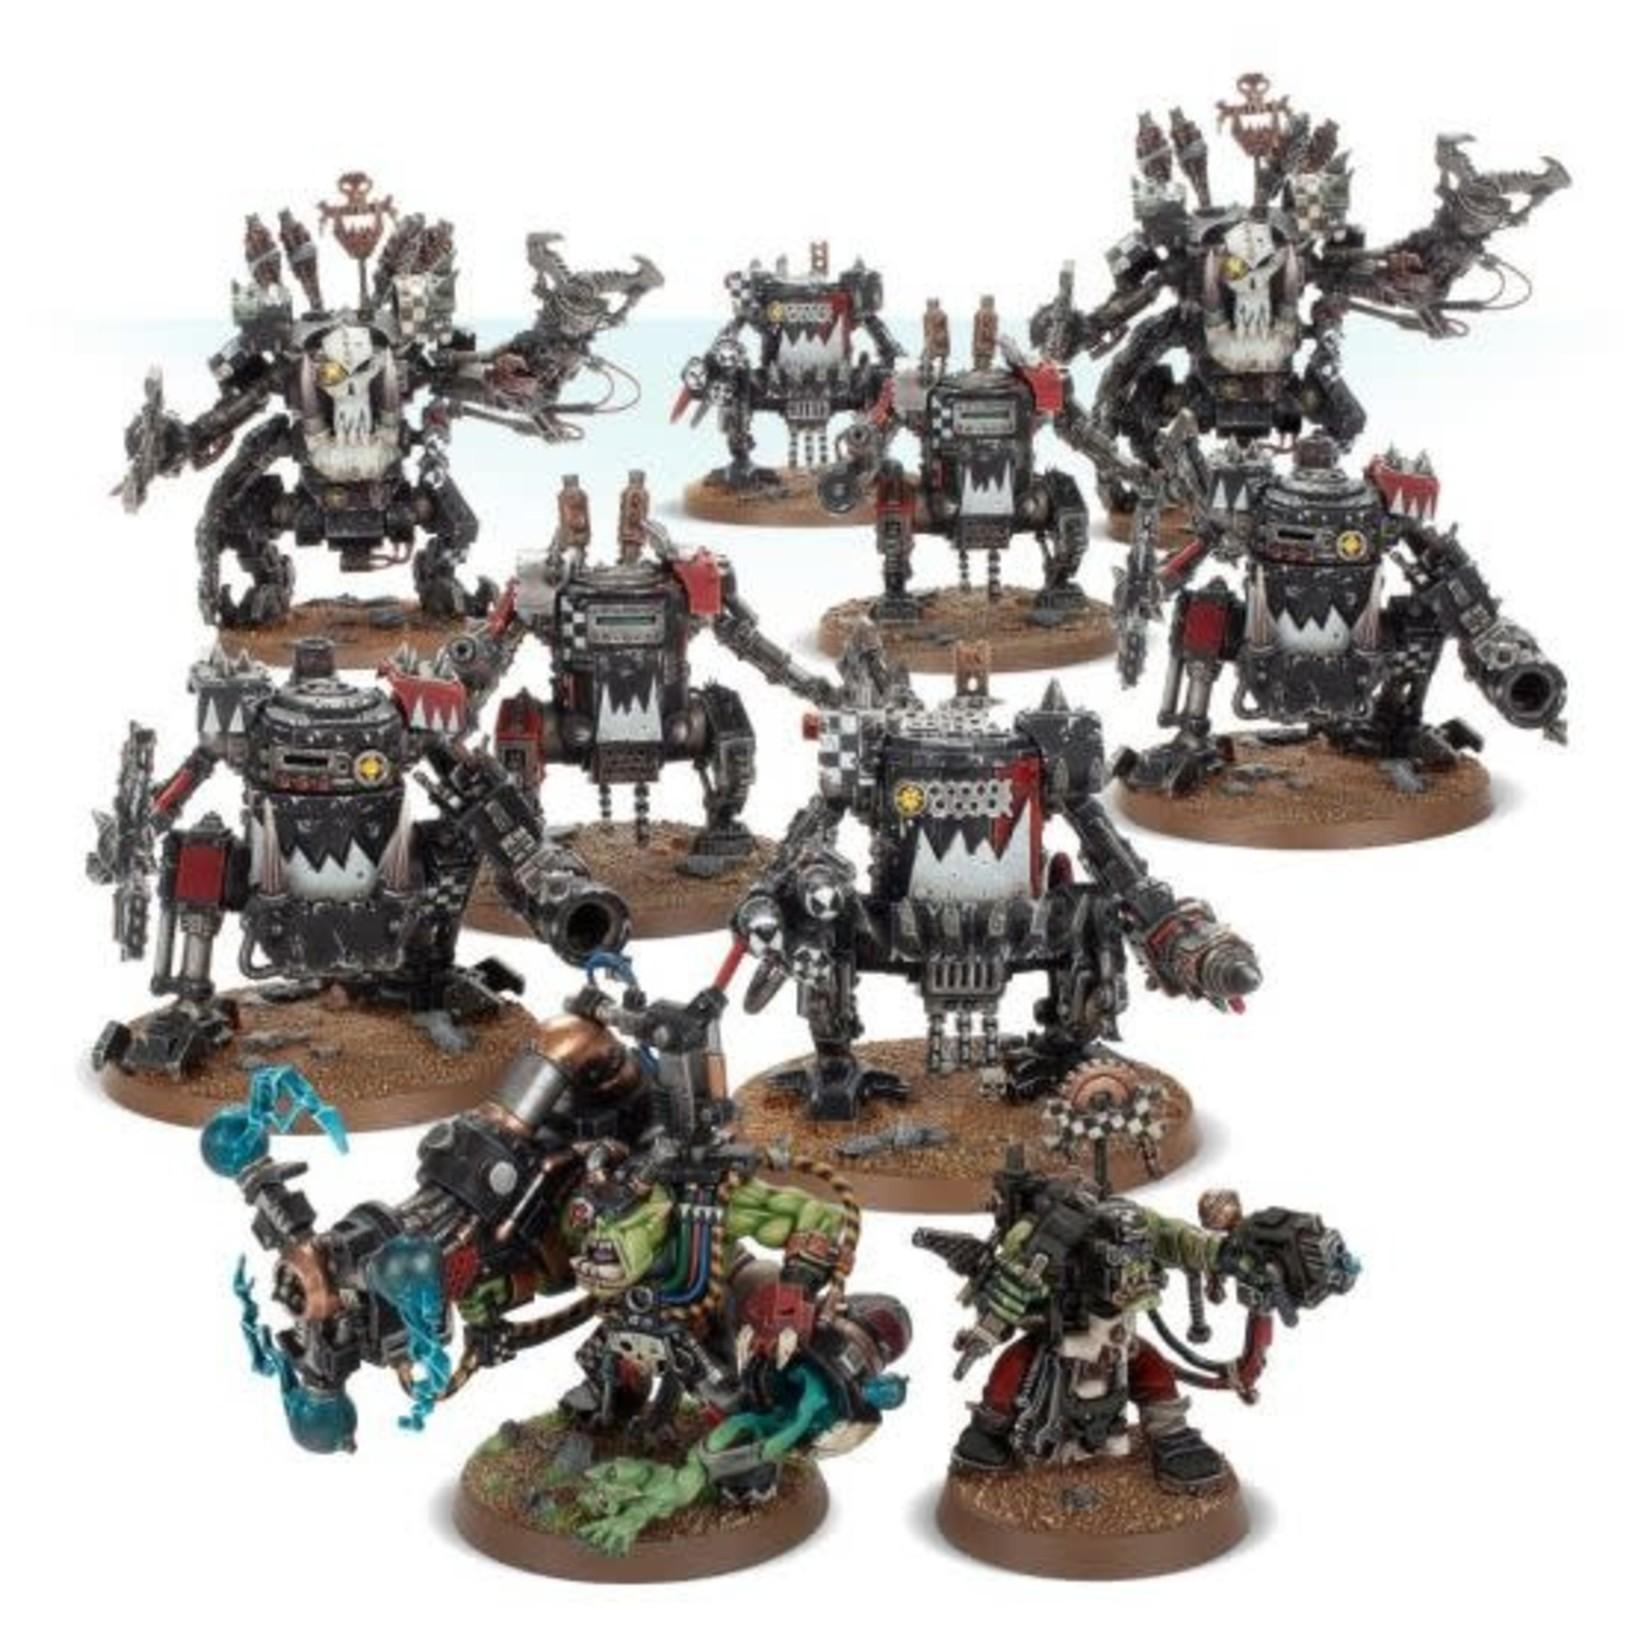 Games Workshop Warhammer 40k Apocalypse: Orks: Spearhead Detachment